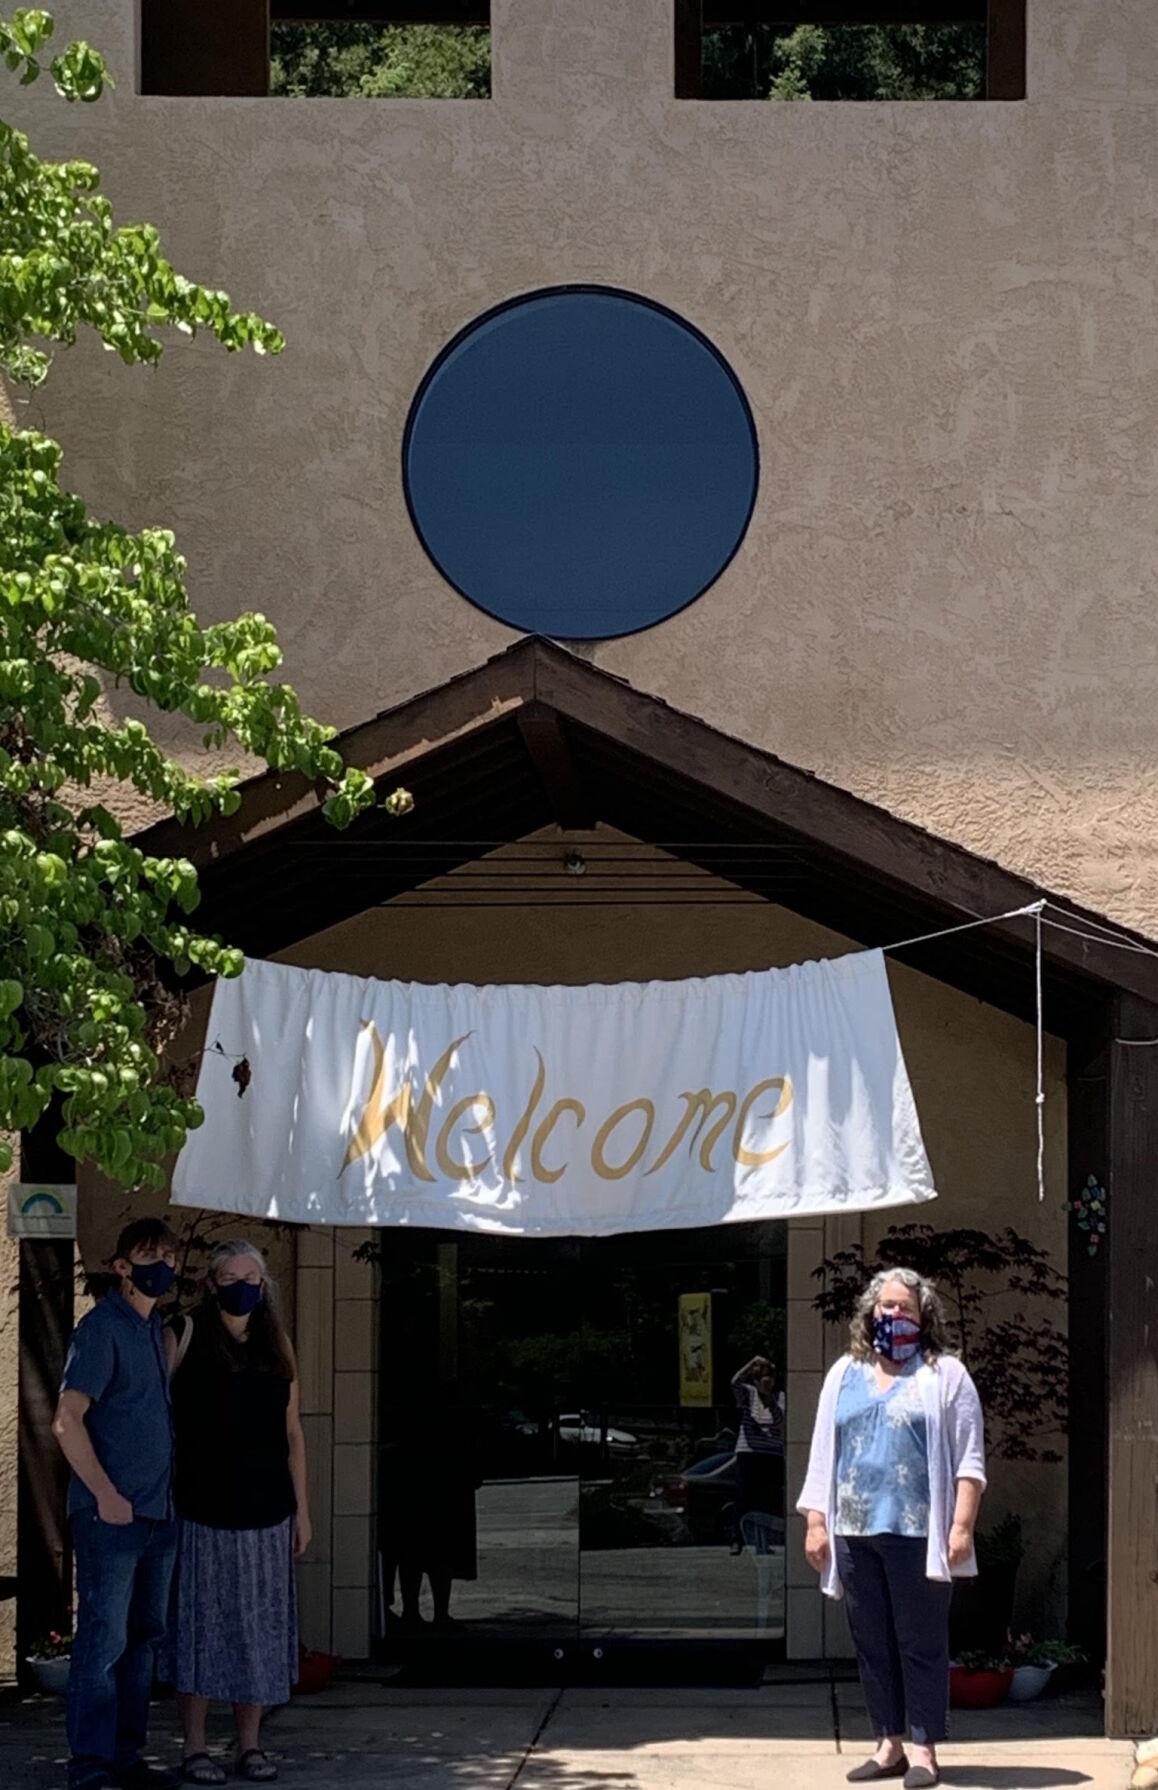 n front of the Welcome sign with Senior Warden Marcus Granger-Jones, and Vestry member Vicky Granger-Jones.